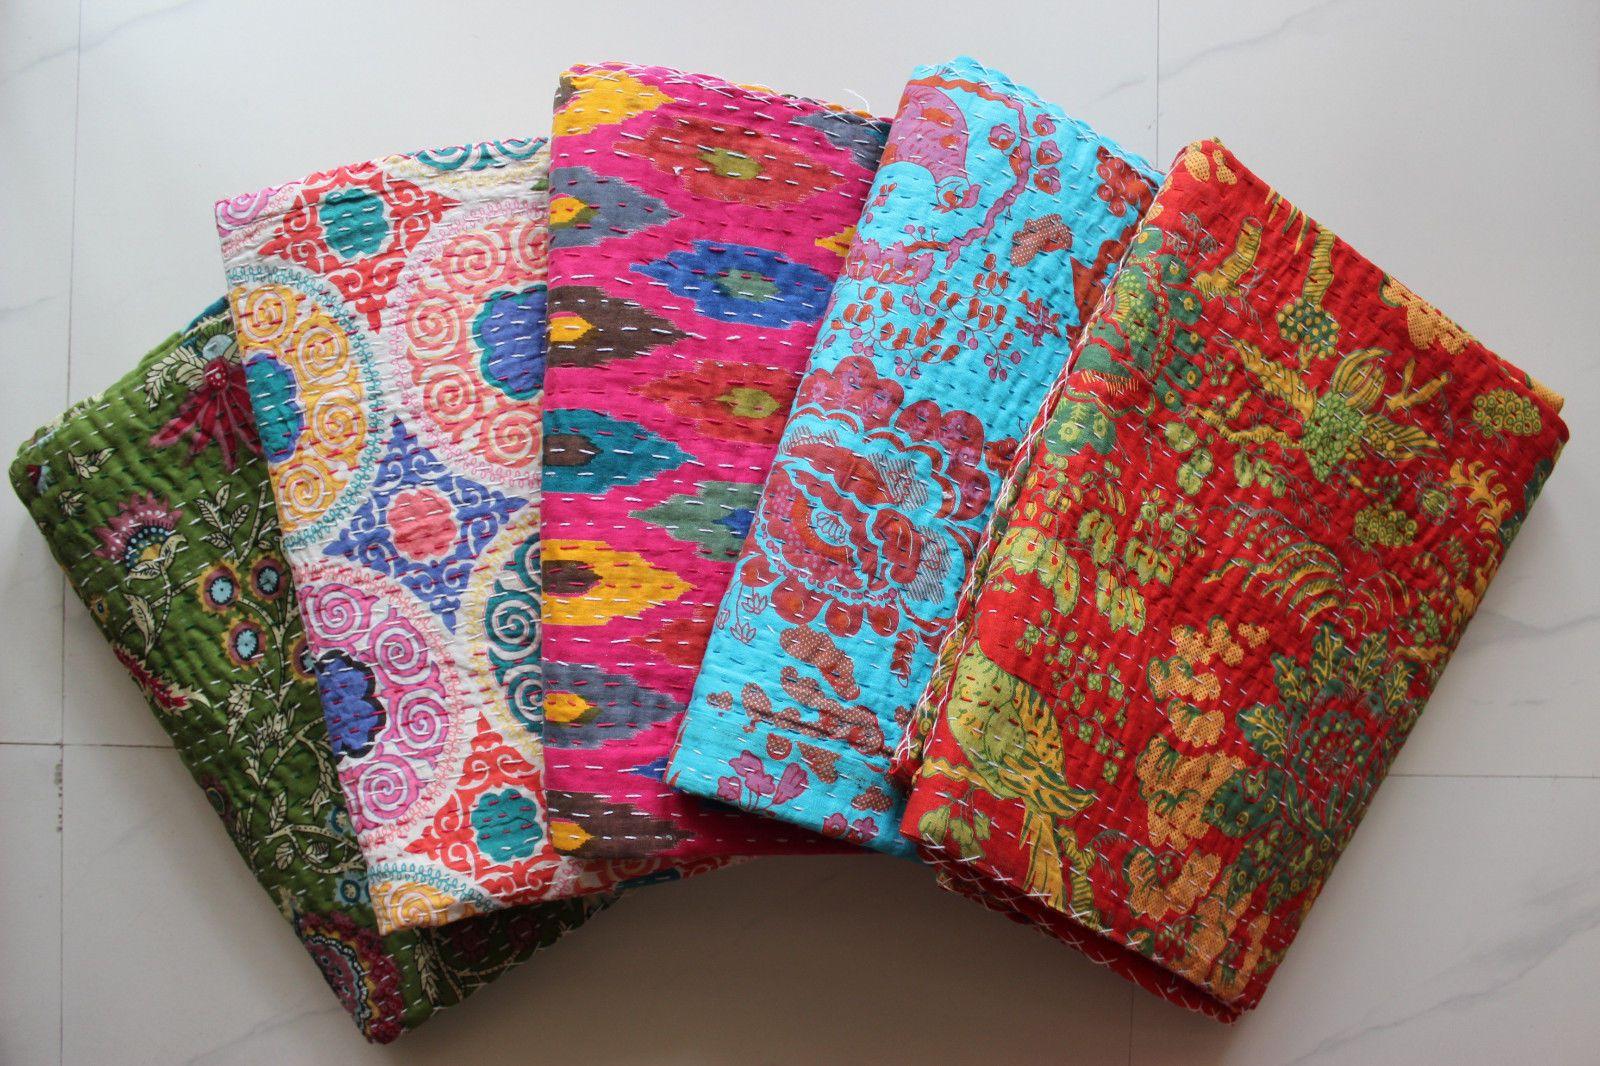 5 Twin Kantha Quilts Throw Gudari Ralli Handmade Cotton Blankets ... : quilted throws wholesale - Adamdwight.com